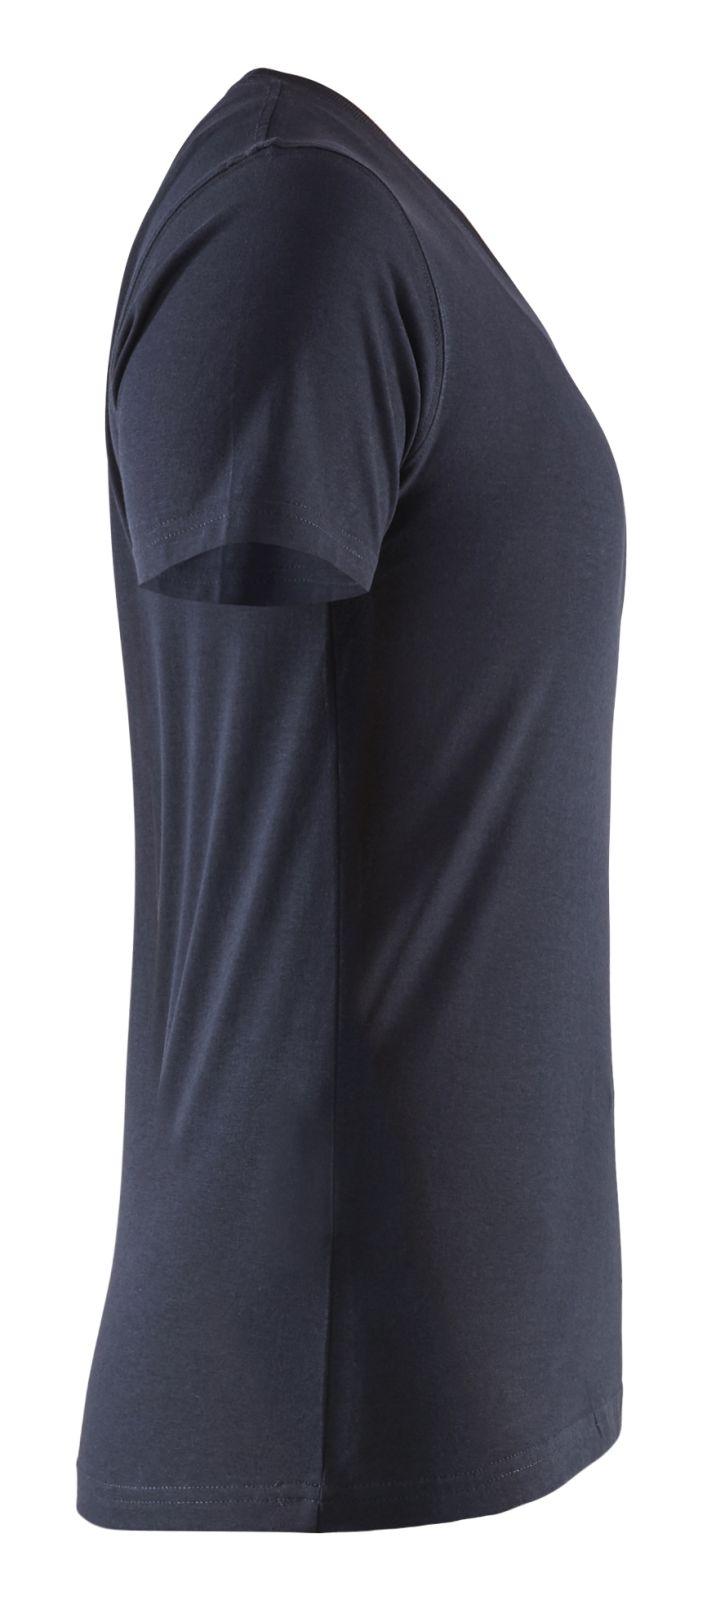 Blaklader Dames T-shirts 33341042 marineblauw(8600)